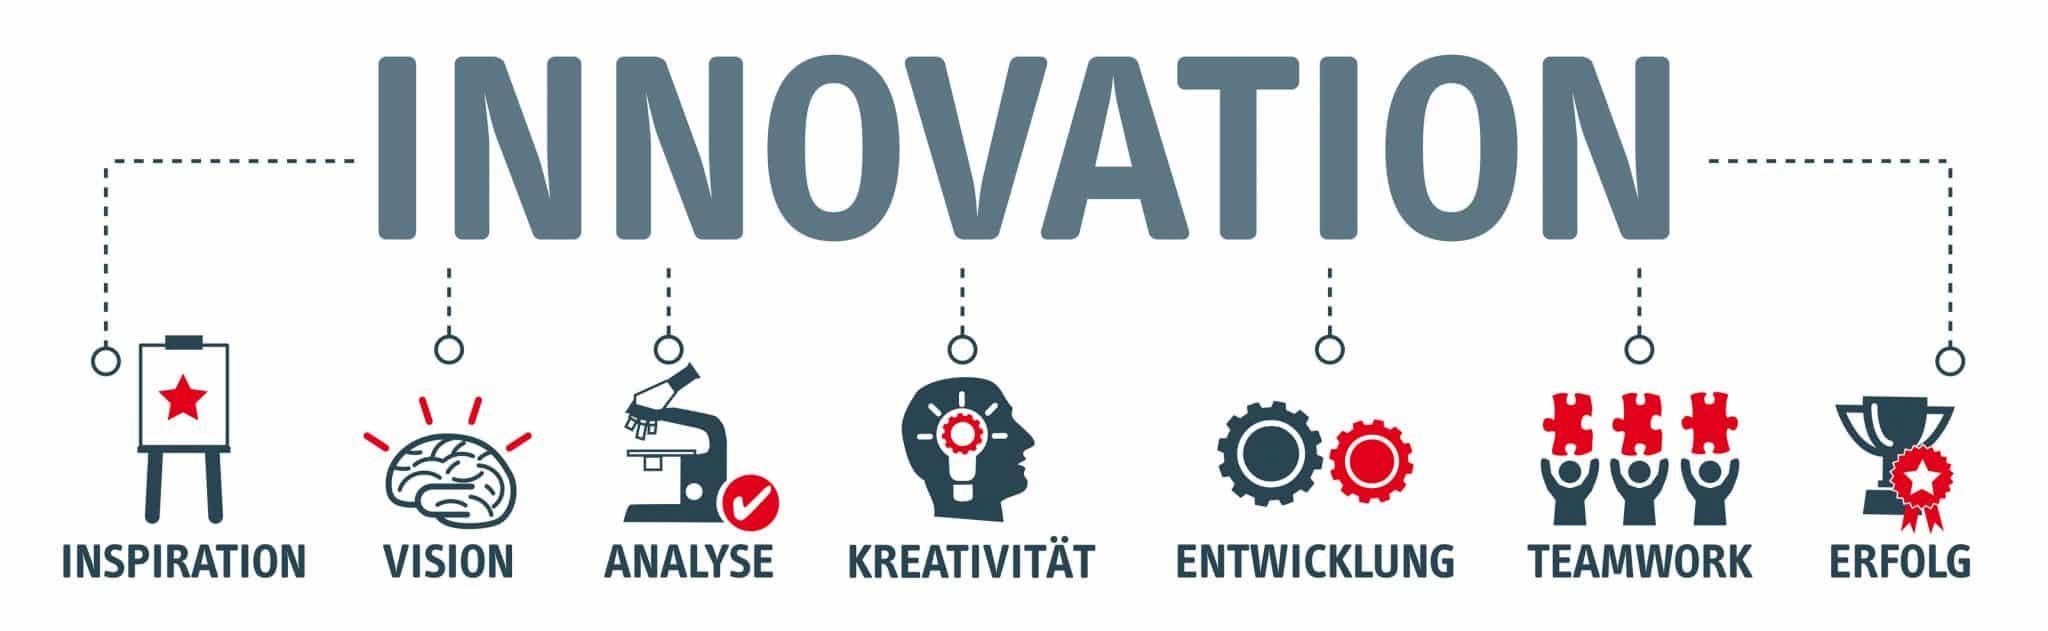 Innovation im Blick behalten